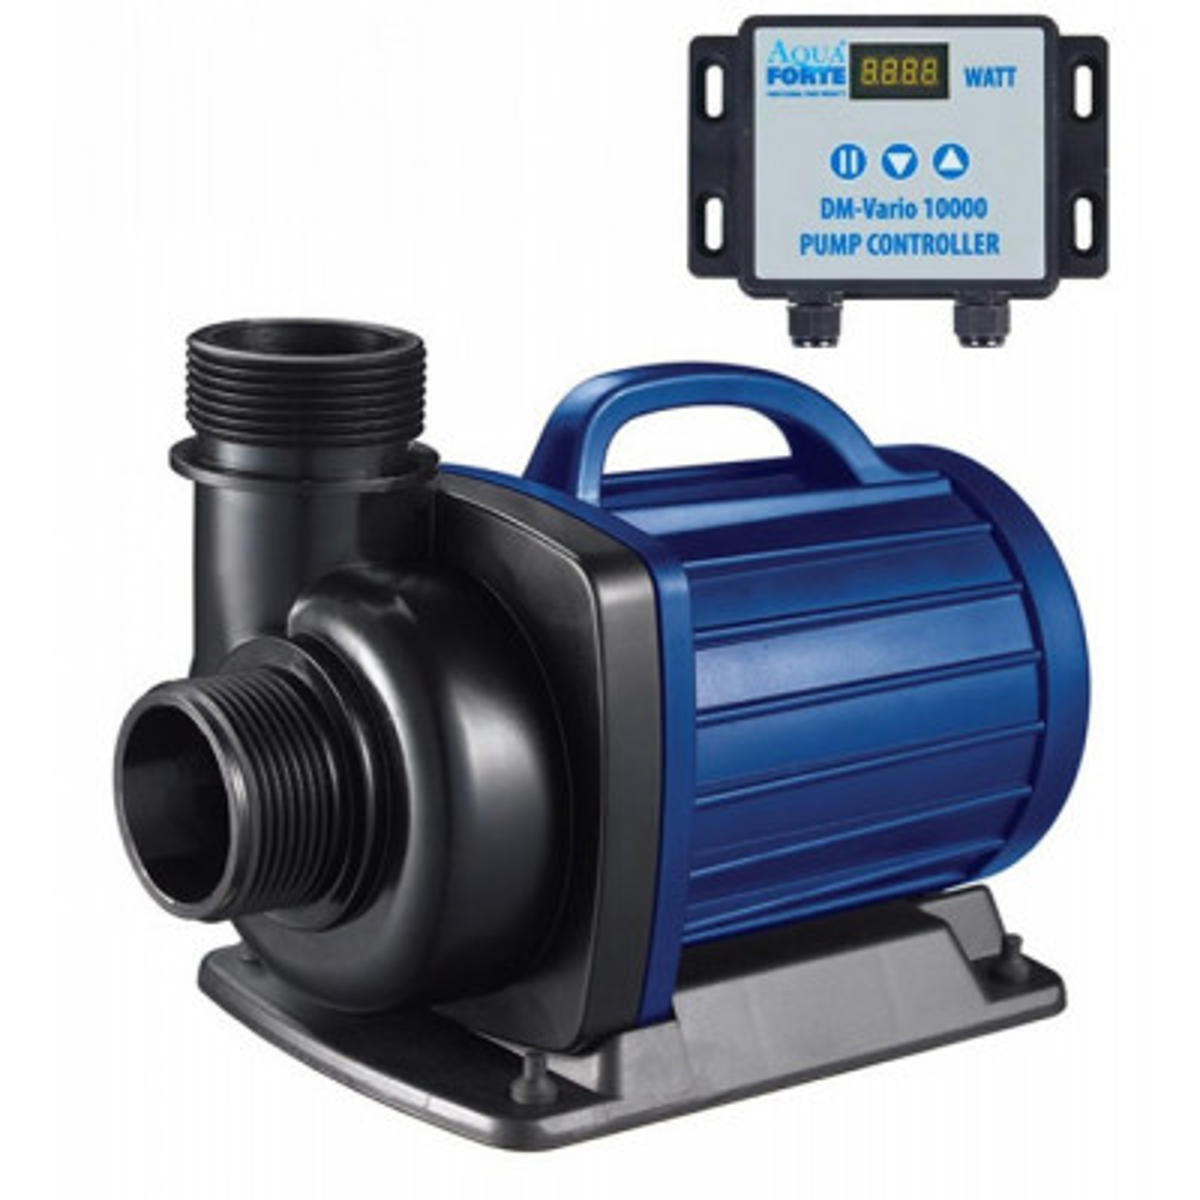 AquaForte DM-10000 Vario Pompe de bassin